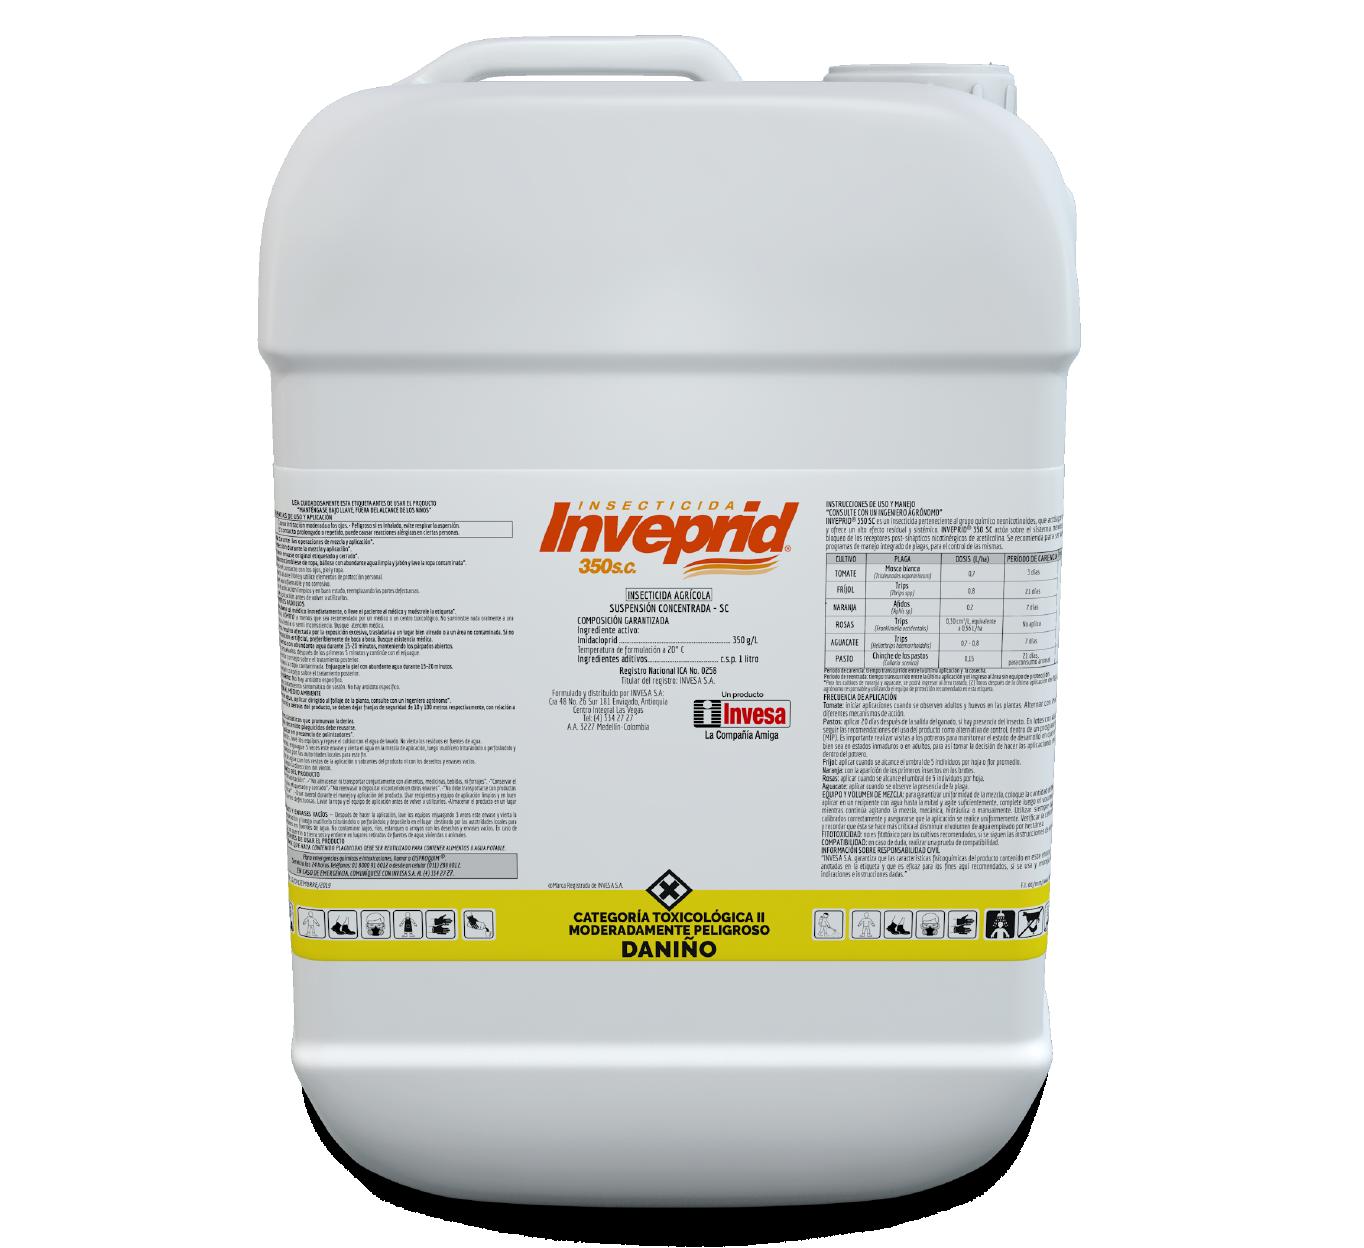 Insecticida inveprid 350 sc invesa 20 litros